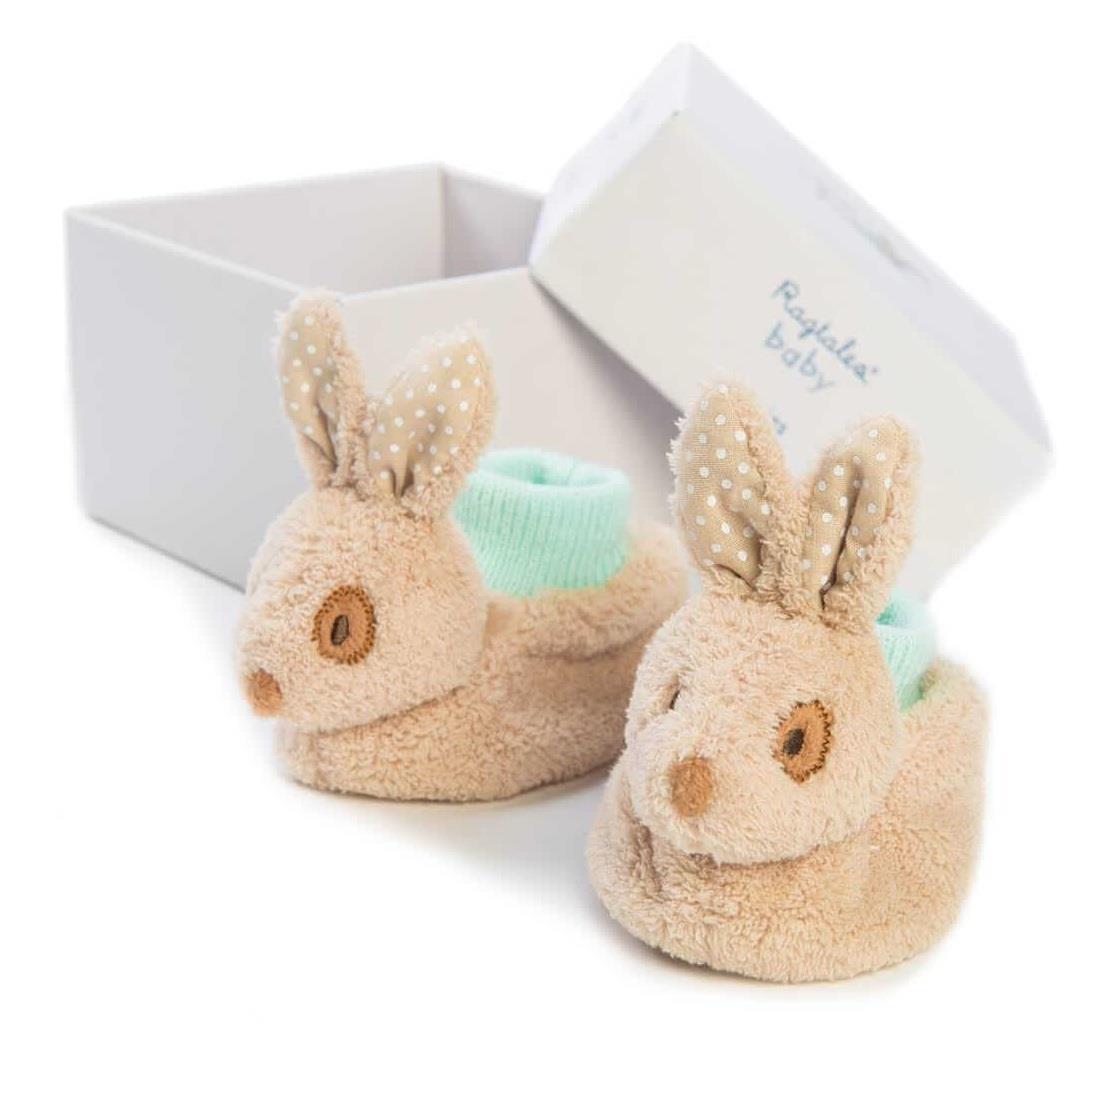 New baby Ragtales Baby Alfie Rabbit Booties For Baby Boy baby shower gift